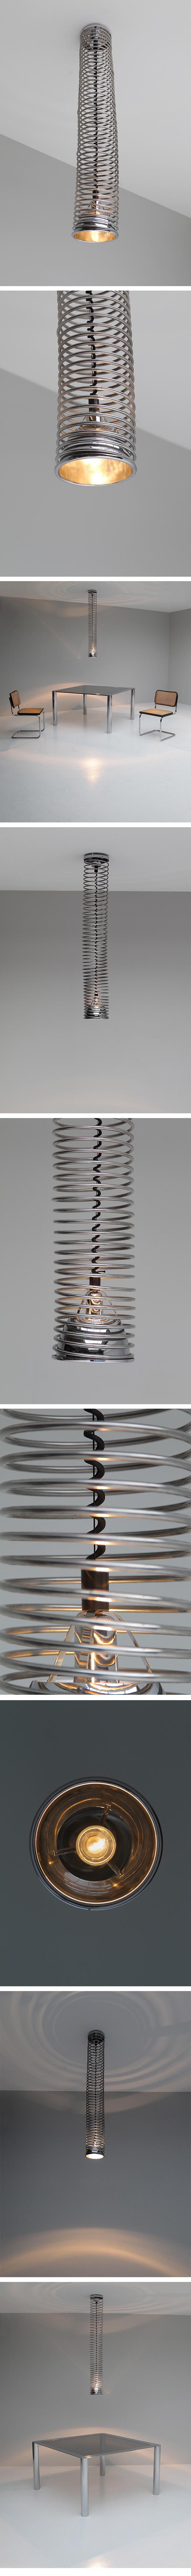 Spiral, haning, lamp, Angelo Mangiarotti, Babur Kerim Incedayi